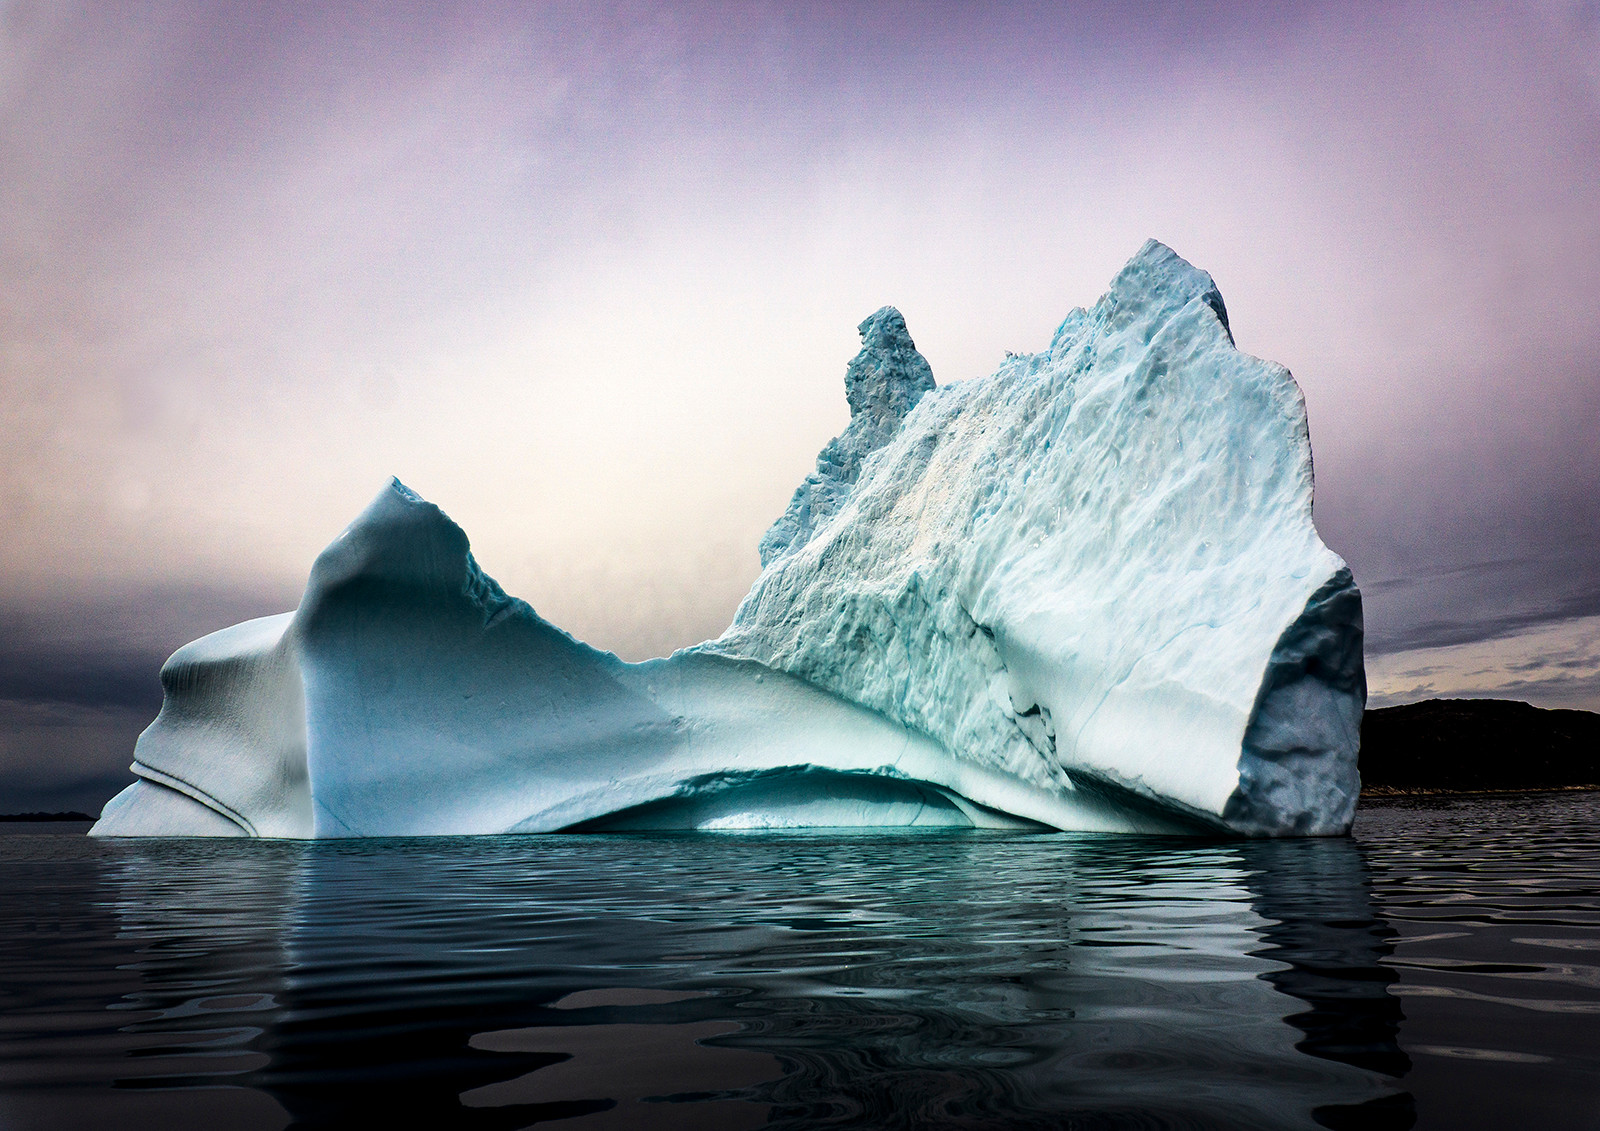 COLOUR - Qassiarsuk Iceberg by Helen Honeyman (10.5 marks)